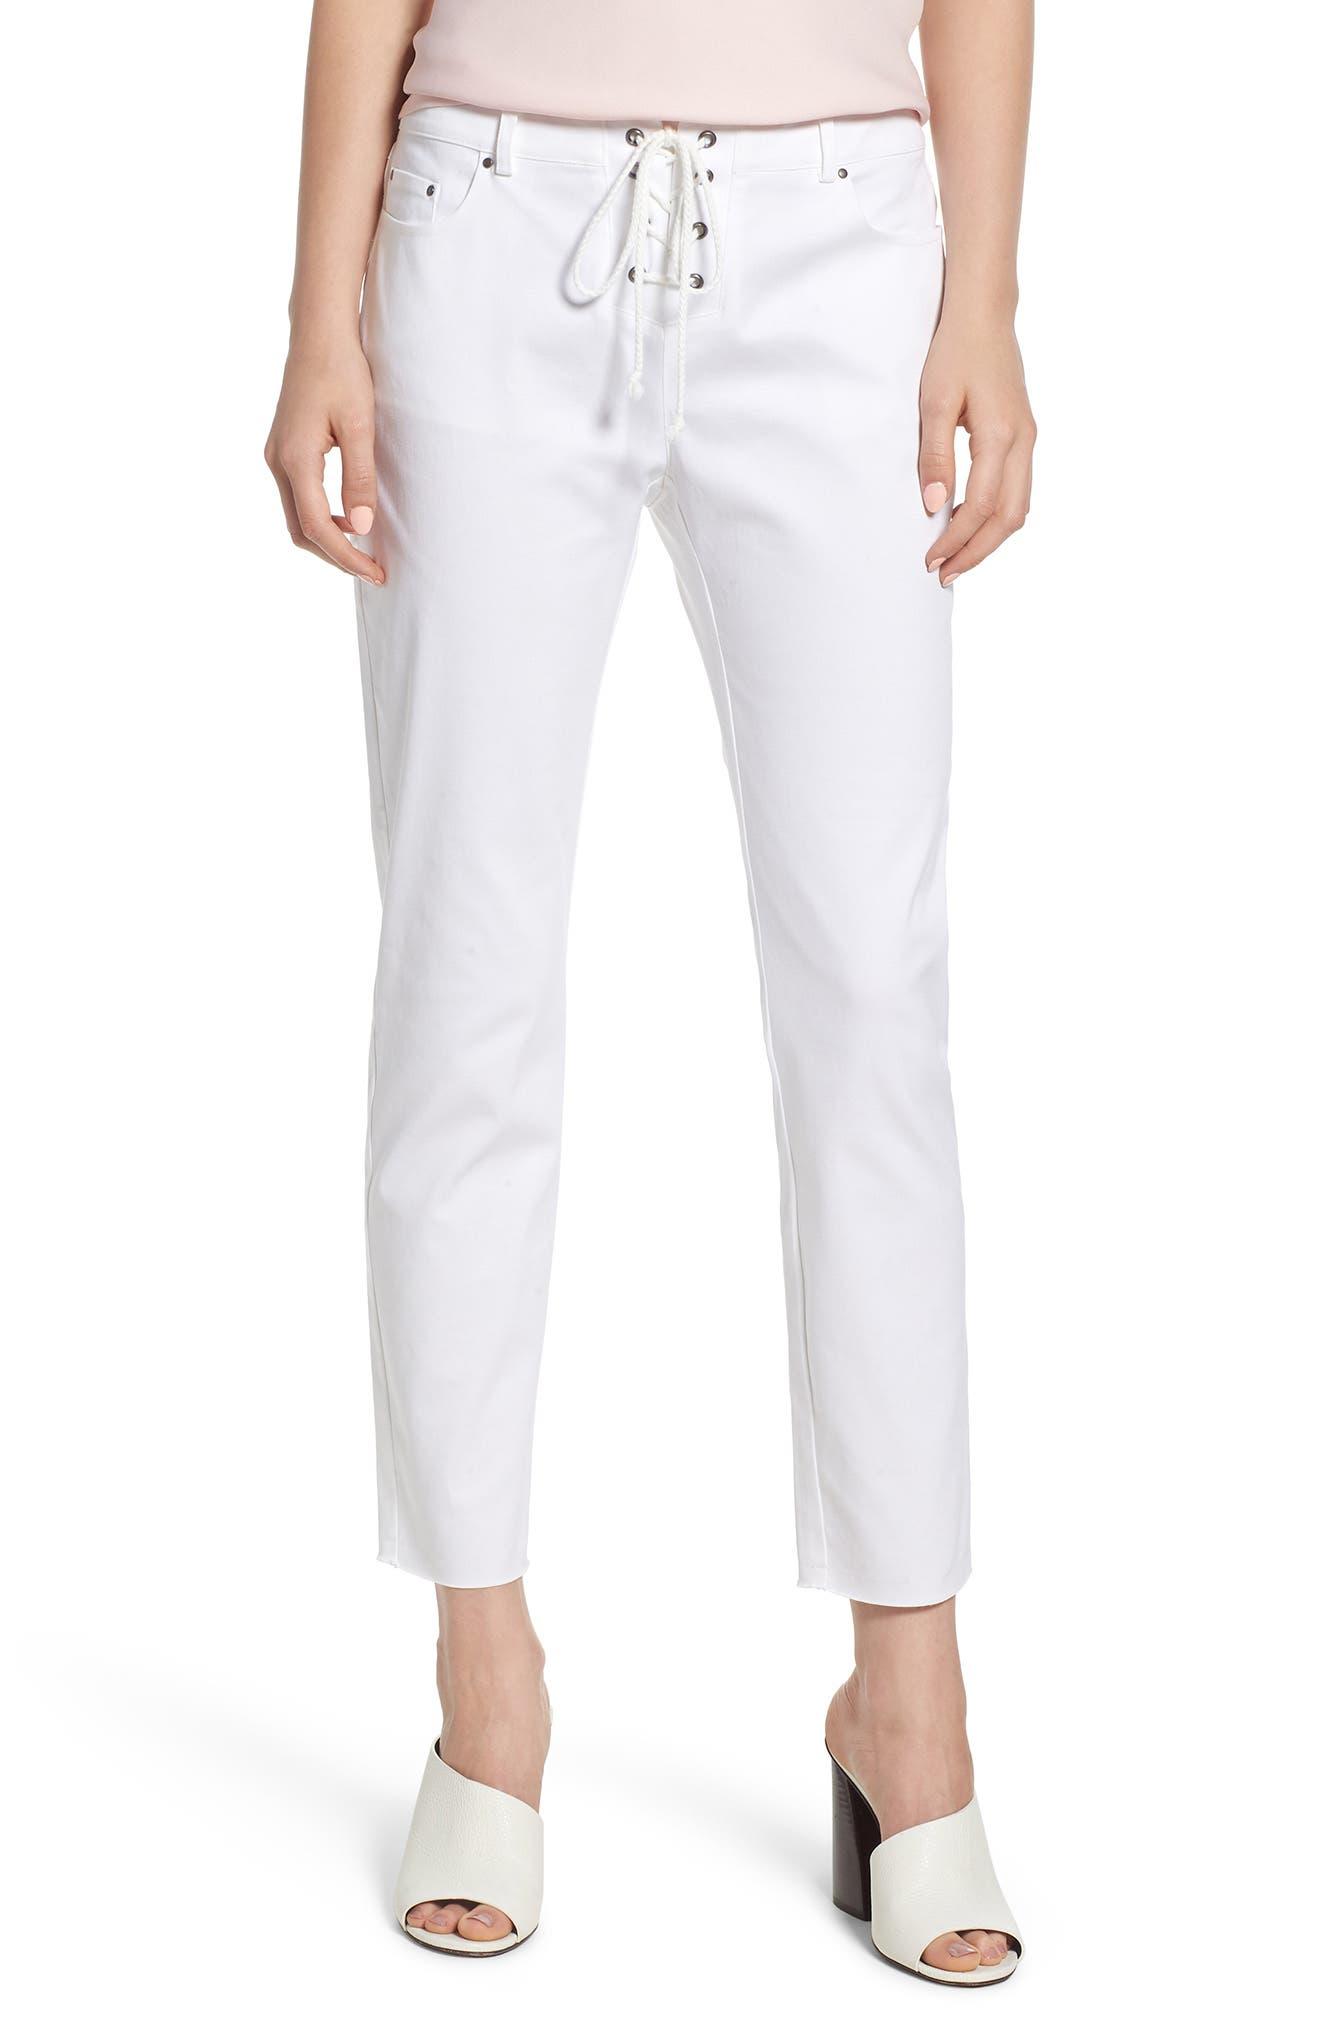 Jalanda Pants,                         Main,                         color, 100